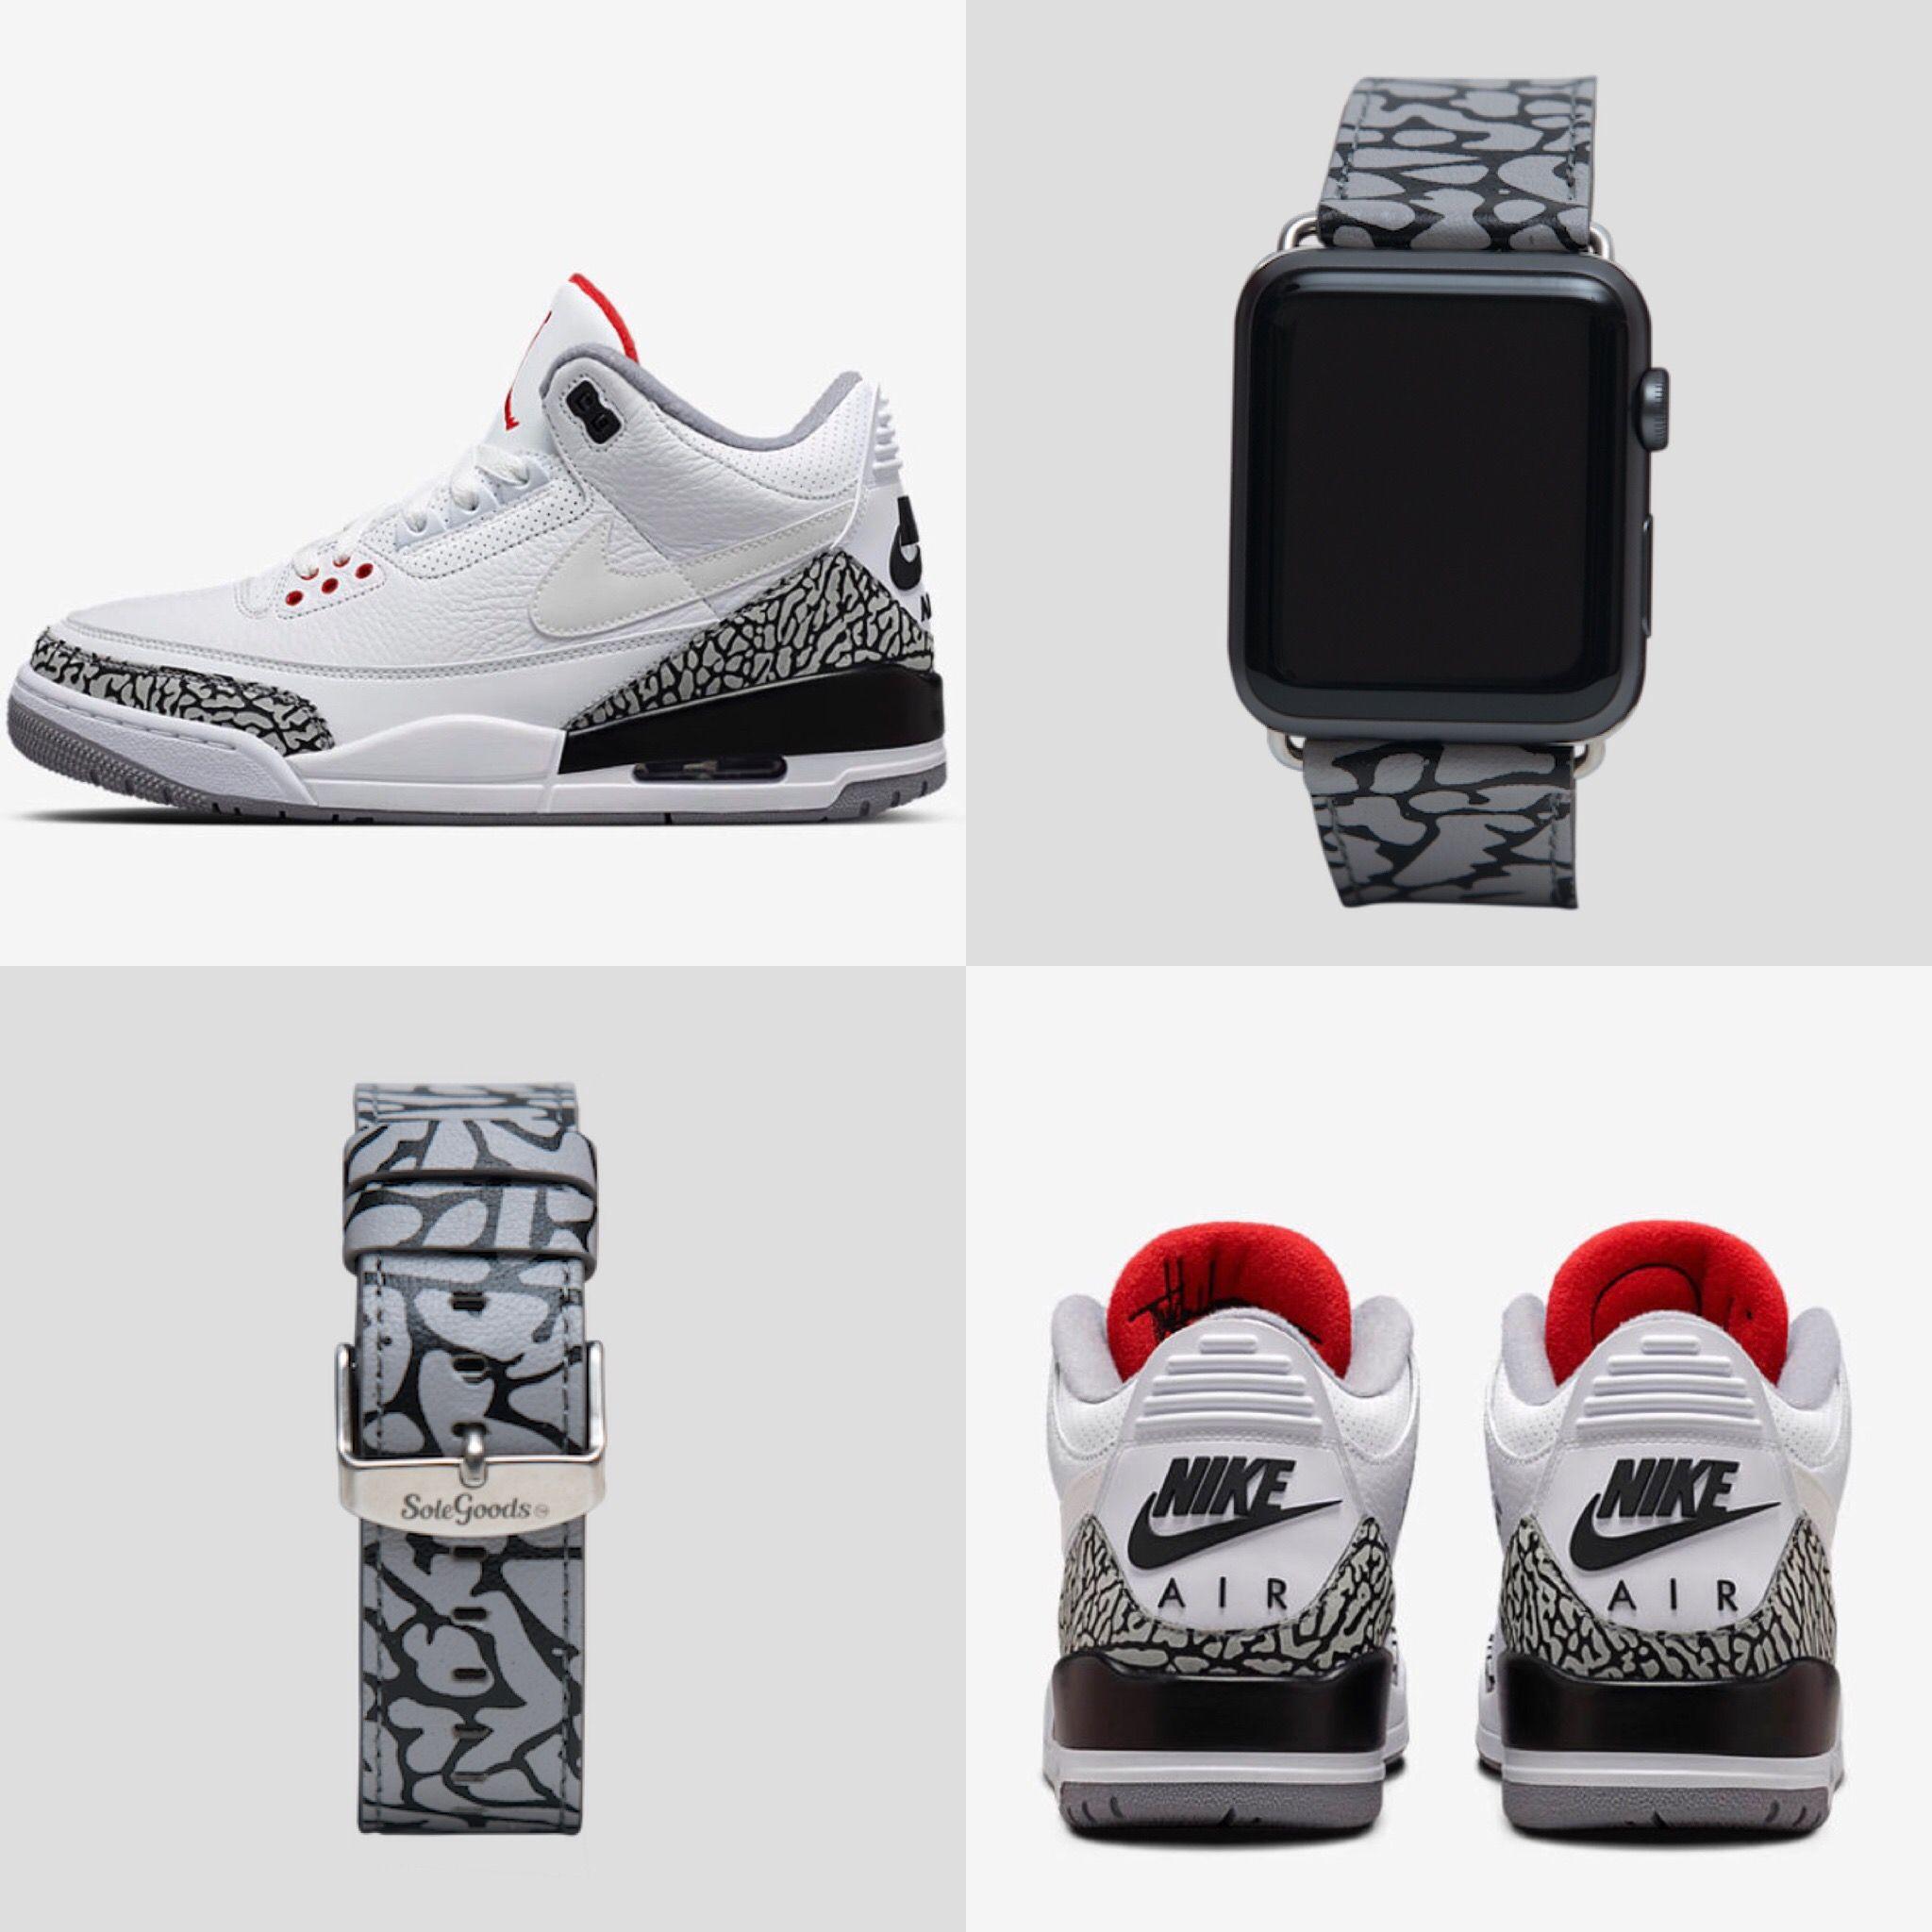 uk availability 5dbe6 bd6dd JTH Air Jordan 3 Justin Timberlake X Tinker Hatfield collab ...